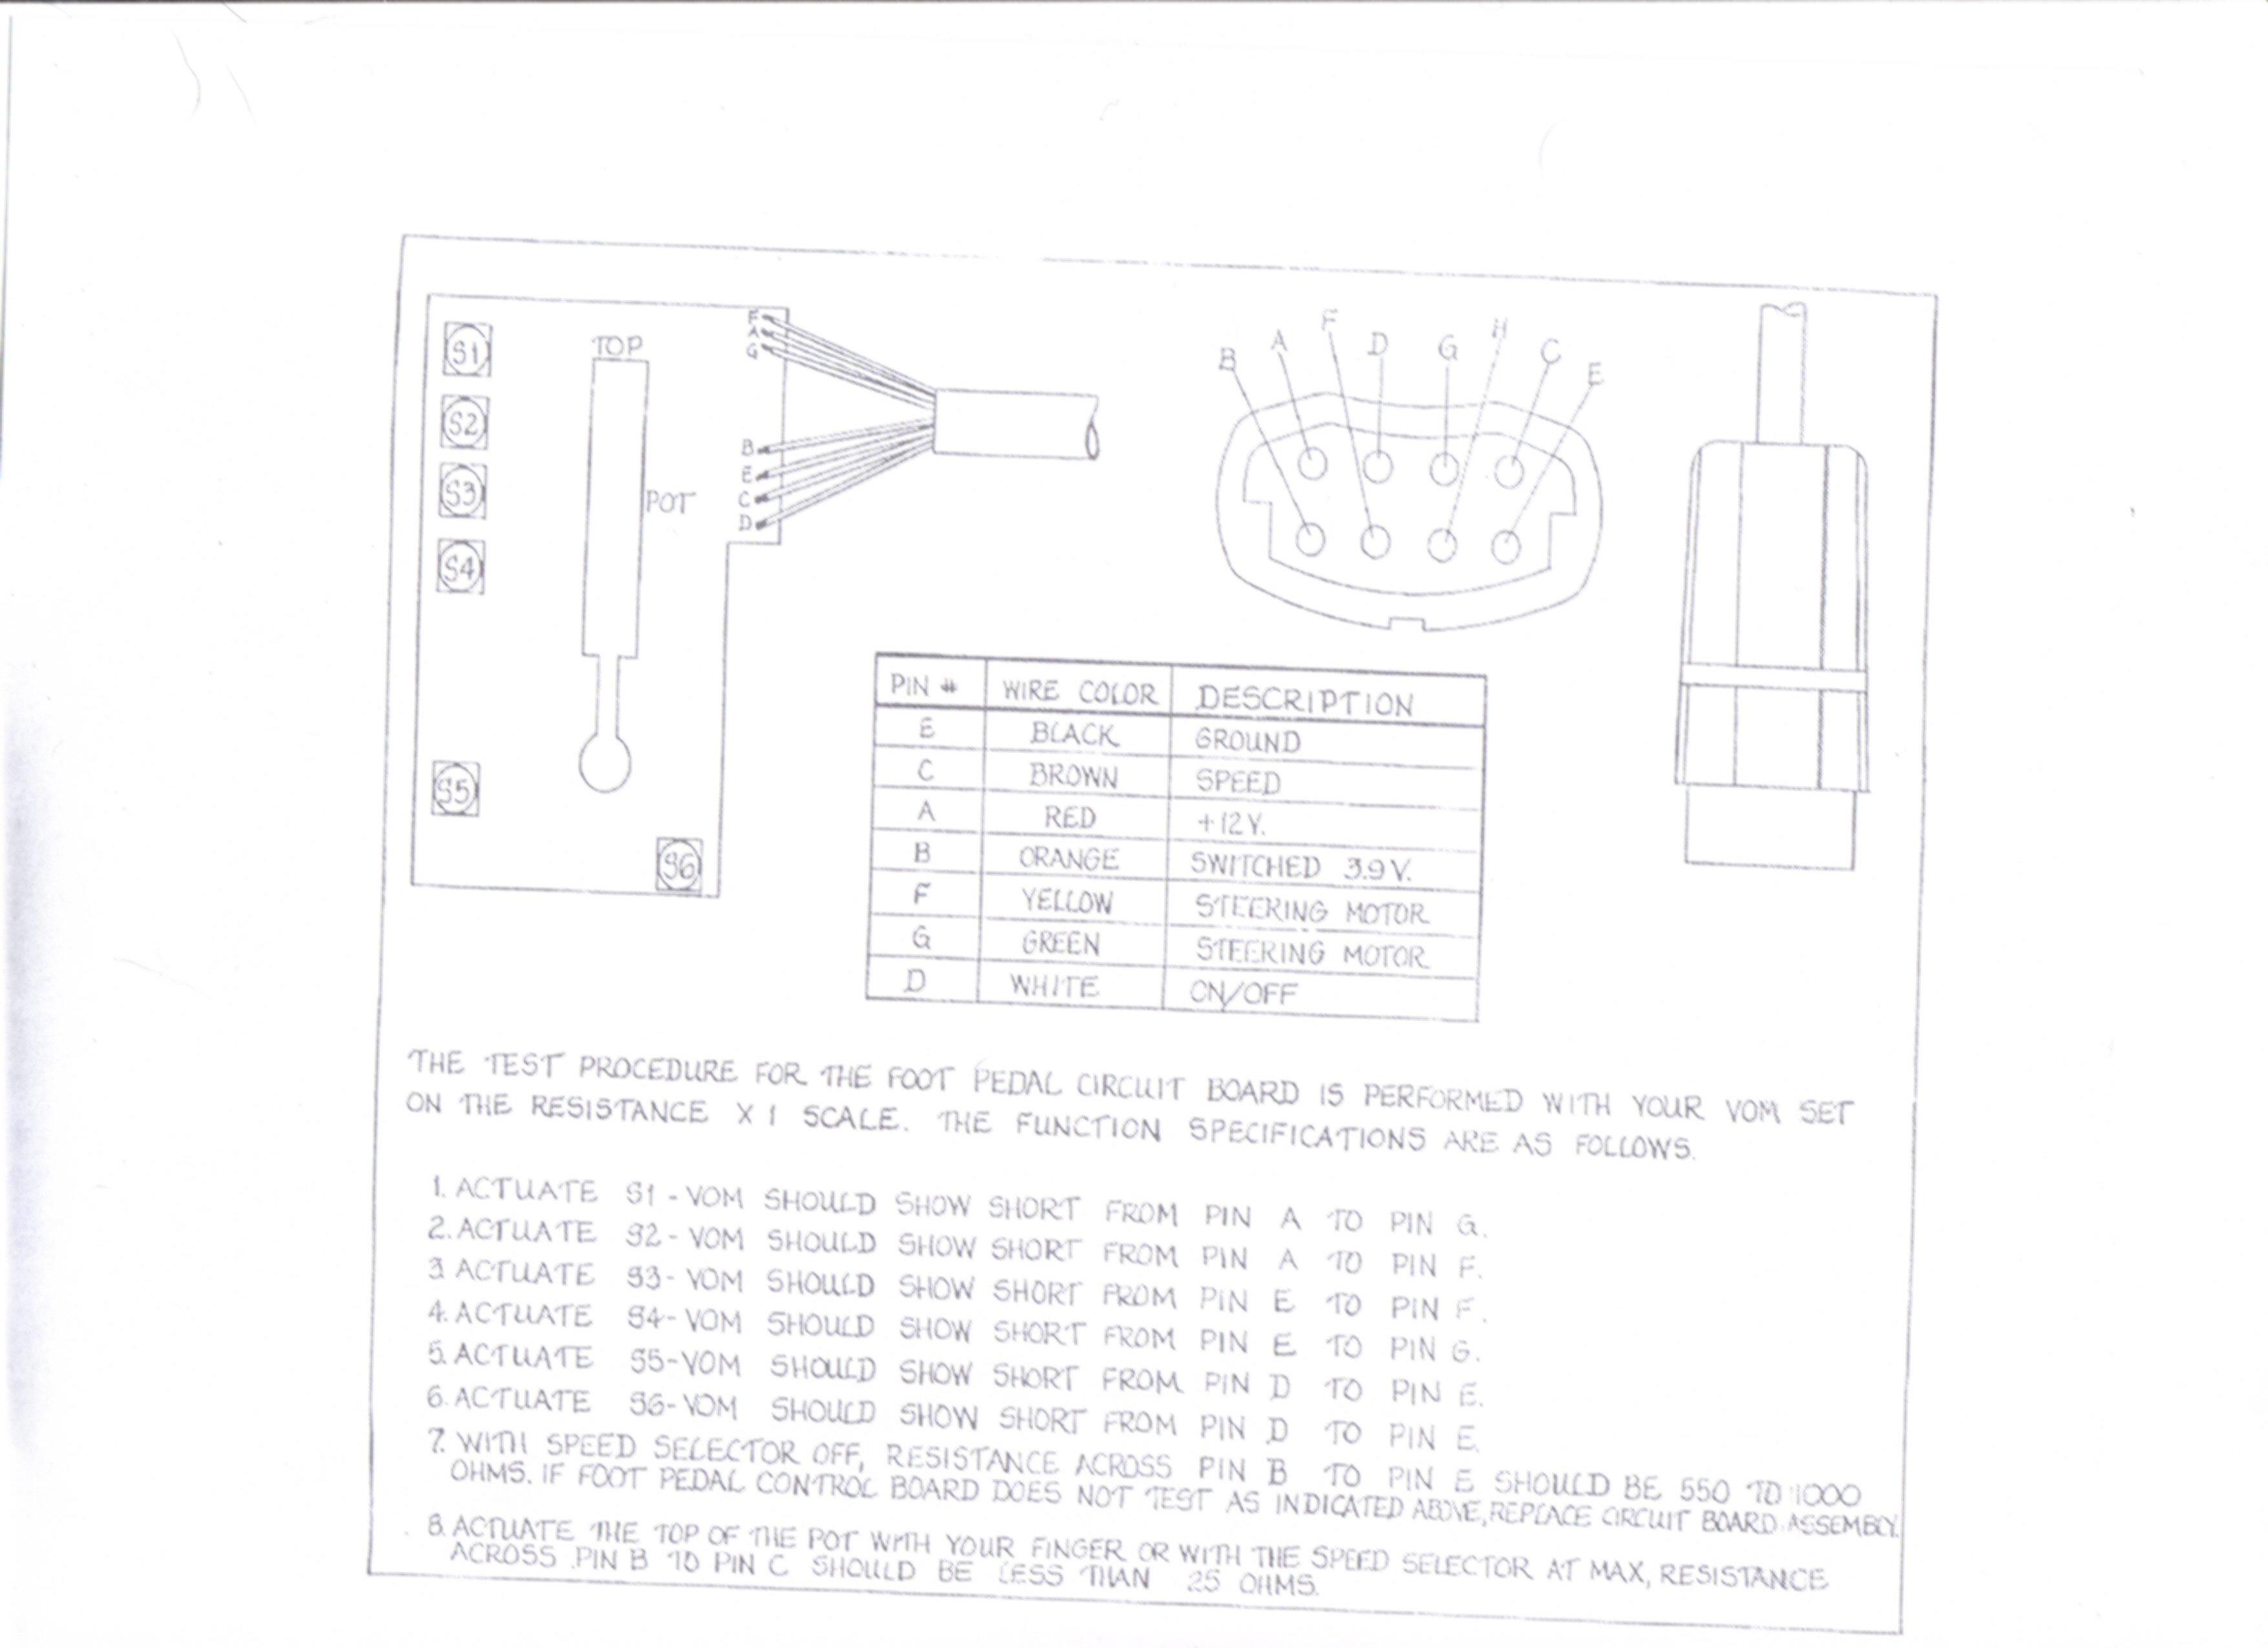 minn kota foot pedal wiring diagram - somurich.com minn kota 12v wiring schematic minn kota battery wiring diagram 36